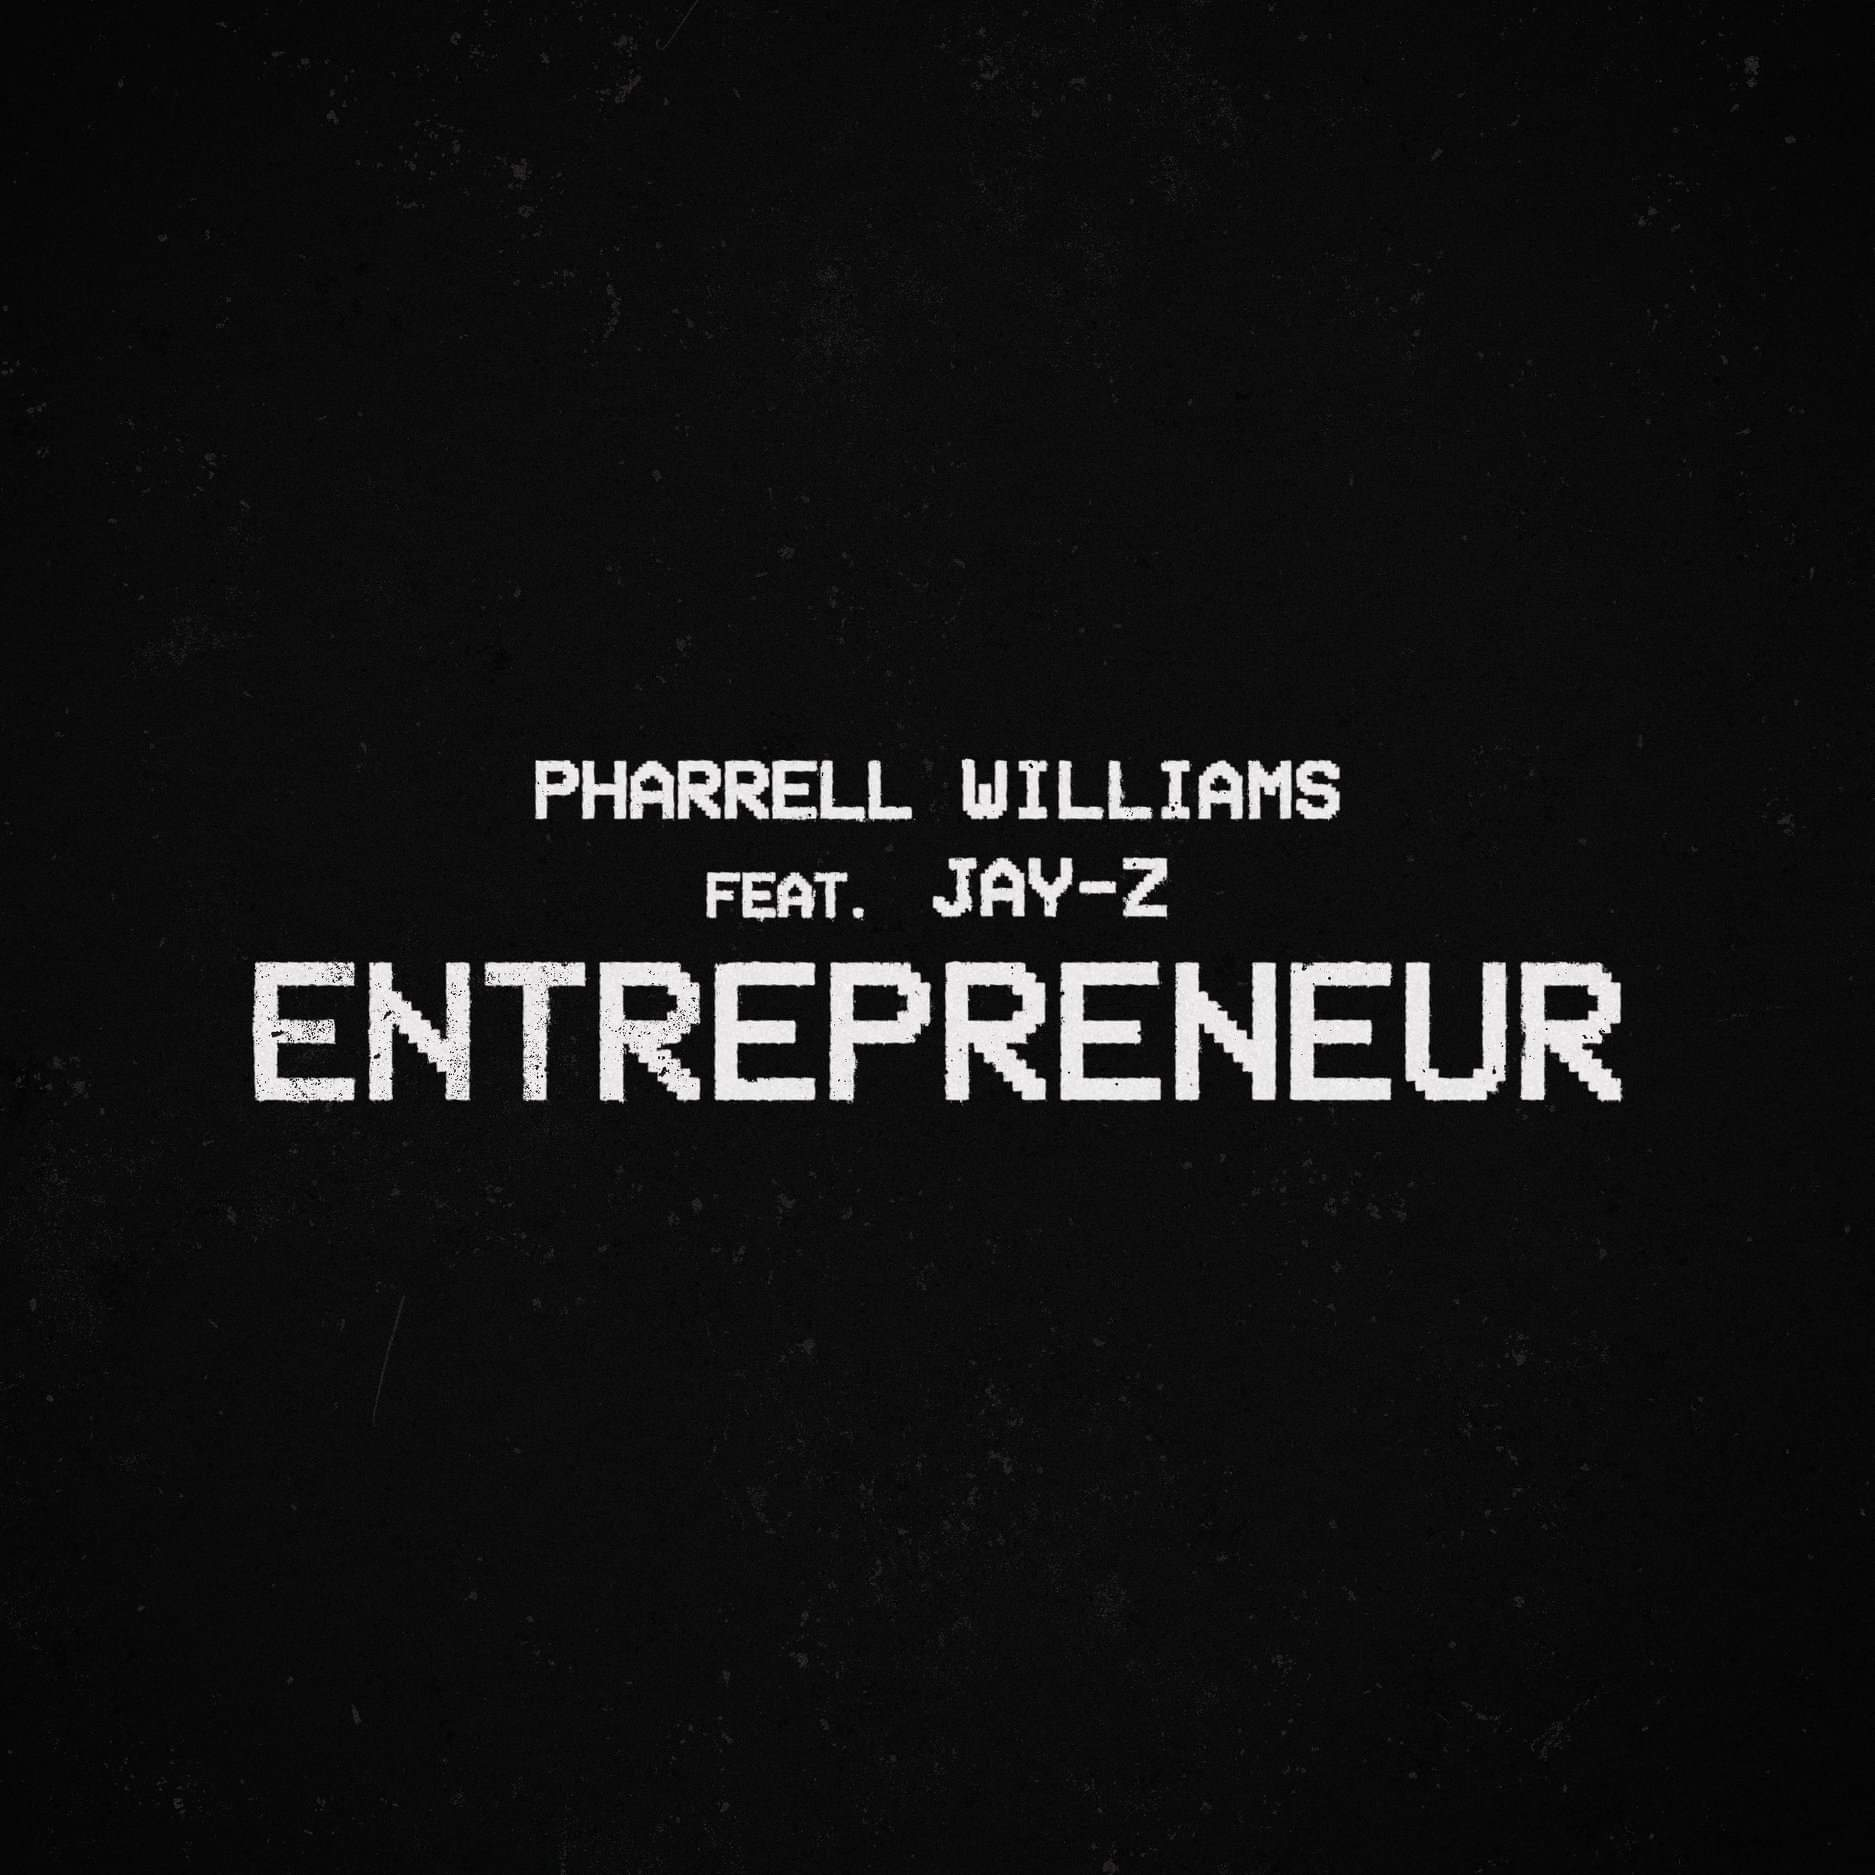 Pharrell - Entrepreneur feat. Jay-Z